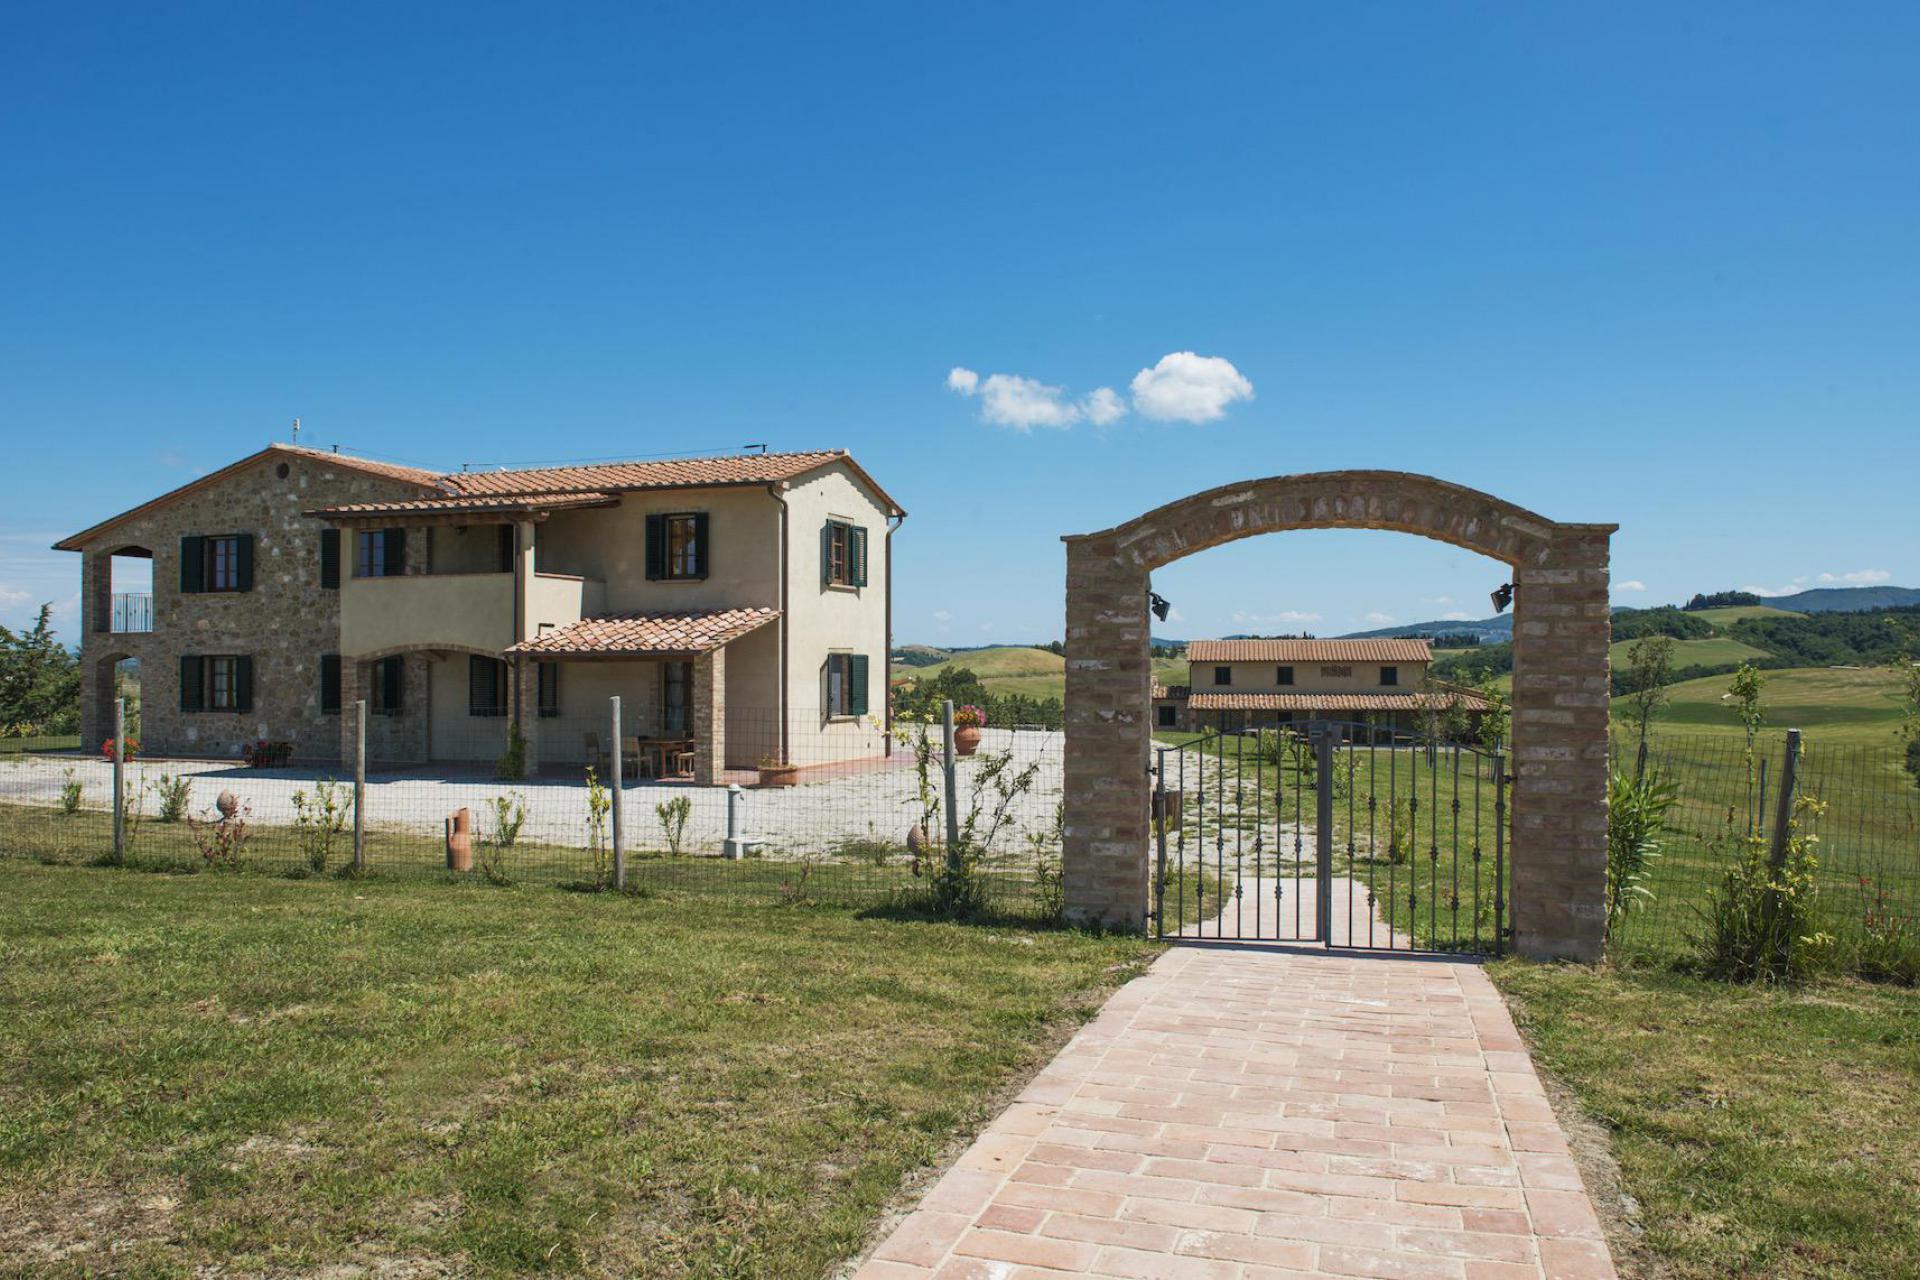 Agriturismo Tuscany Family-friendly agriturismo Tuscany with lovely pool